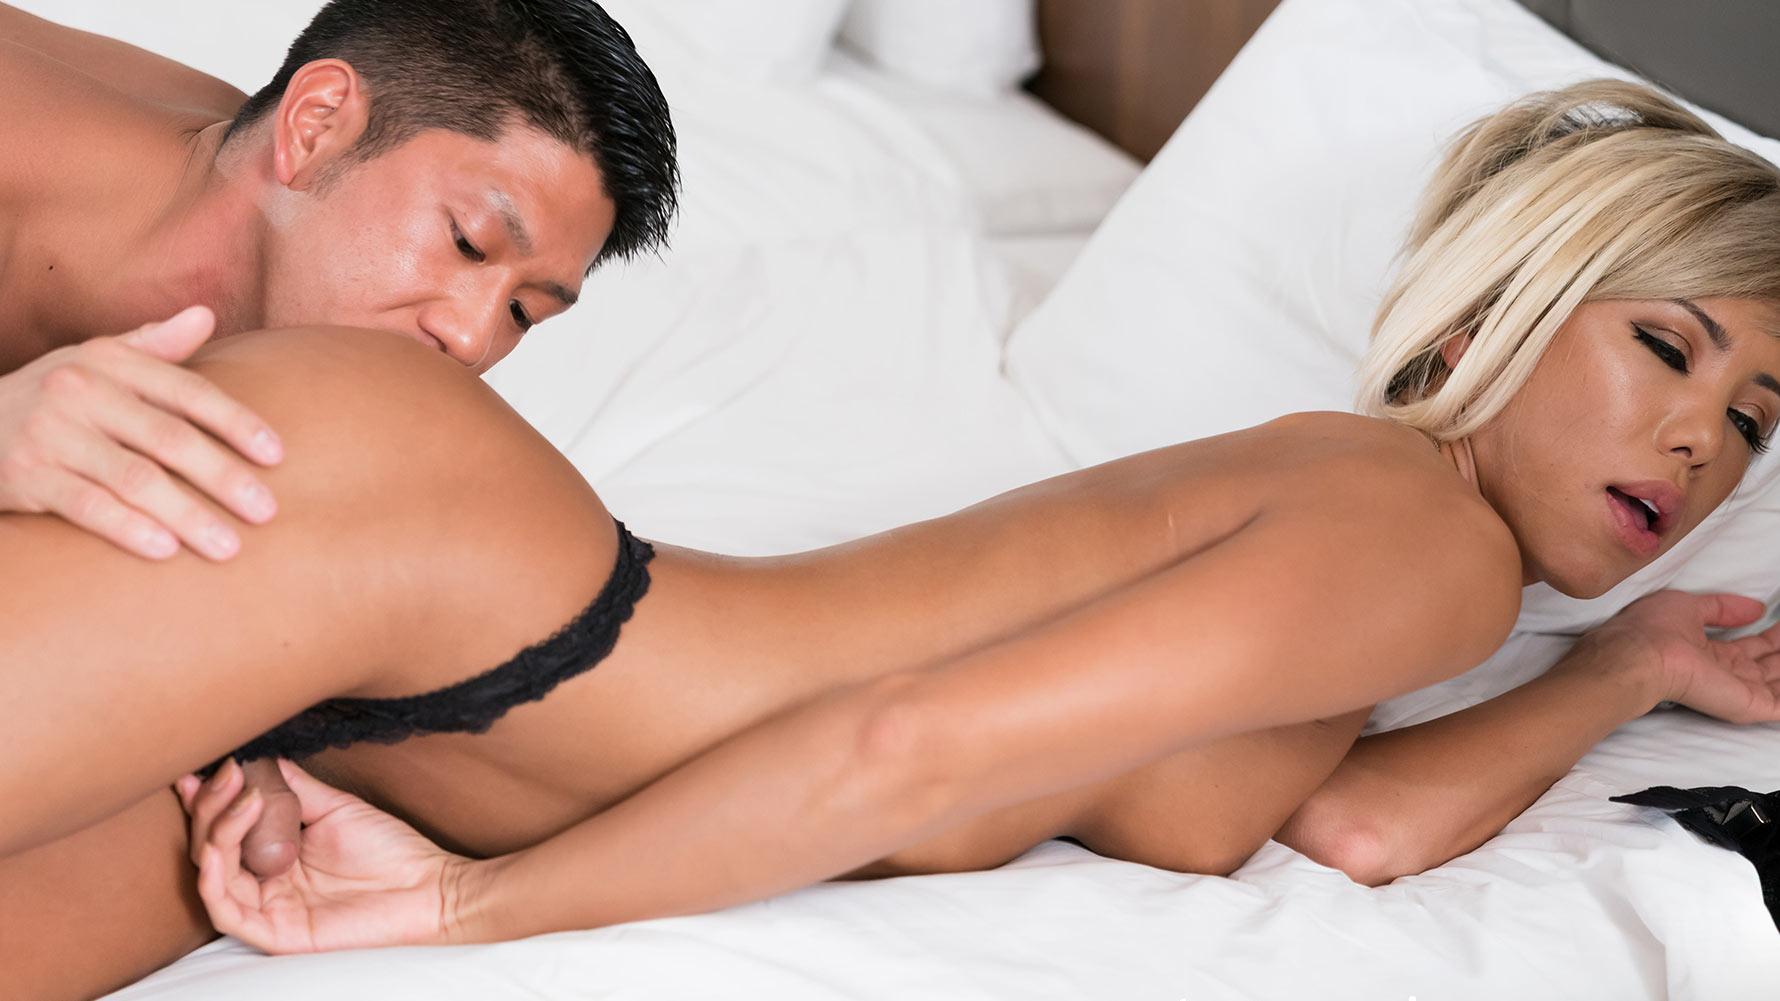 [2018-04-13] Miran Threesome Wild Sex  - TranSexJapan